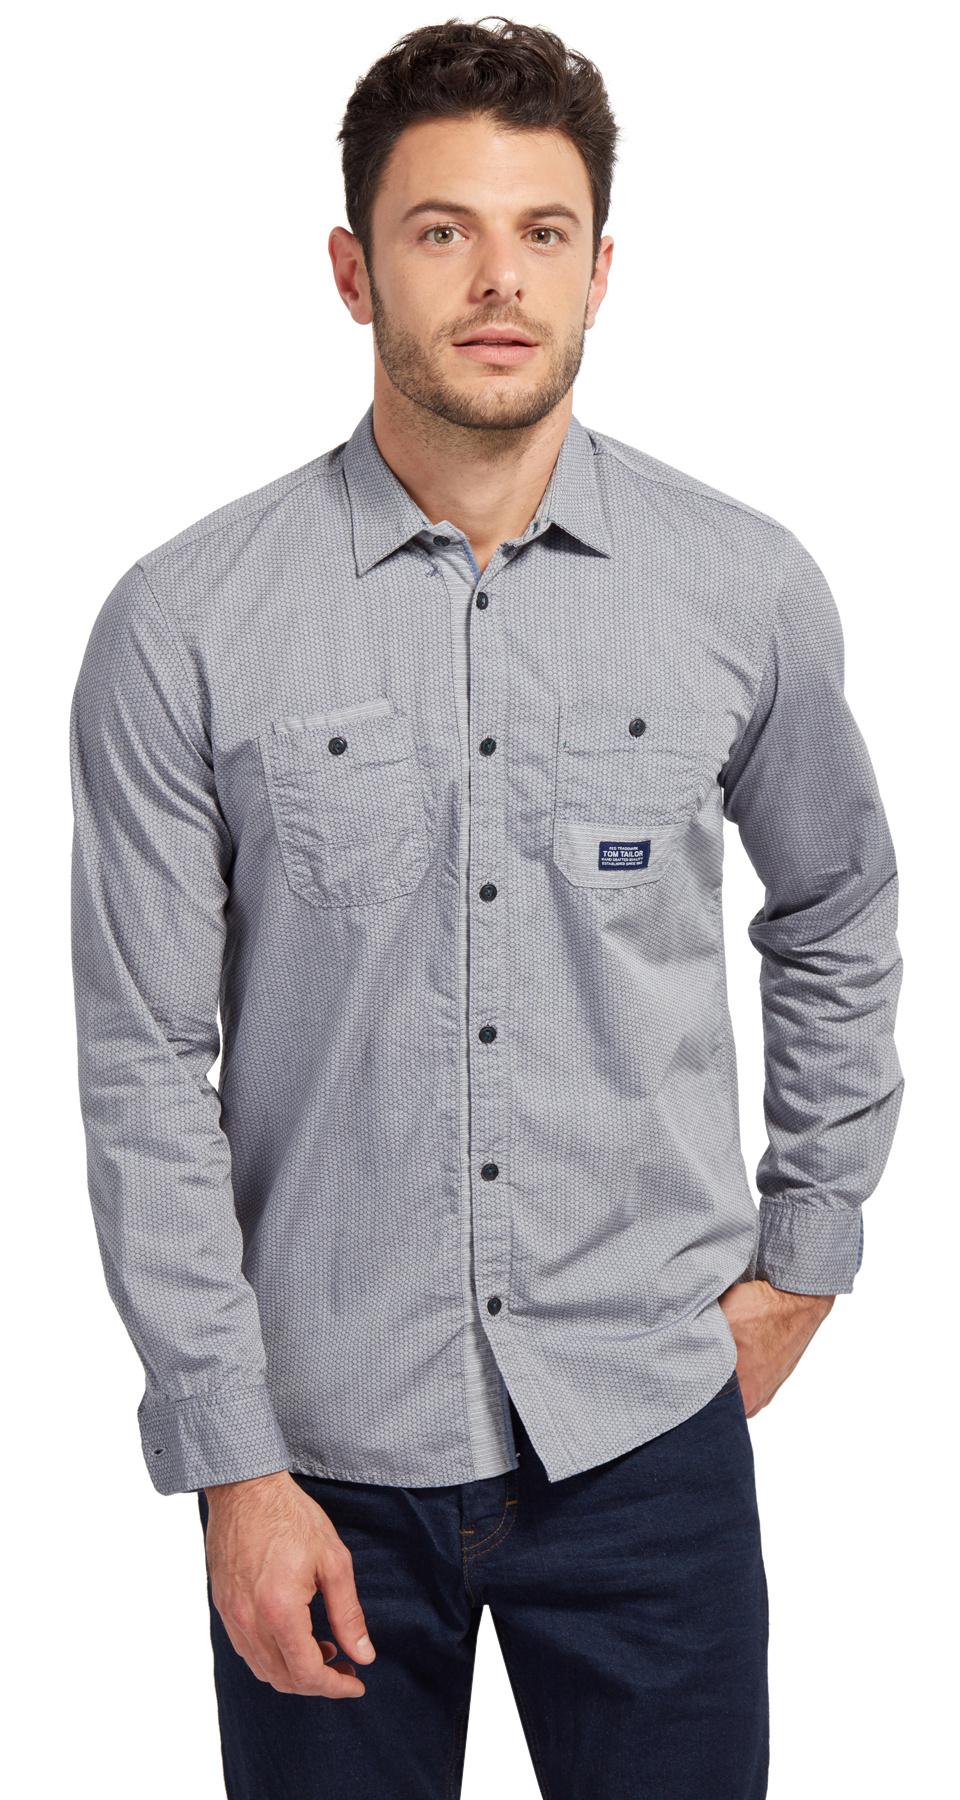 Tom Tailor pánská košile 20337290010/6811 Modrá XXL